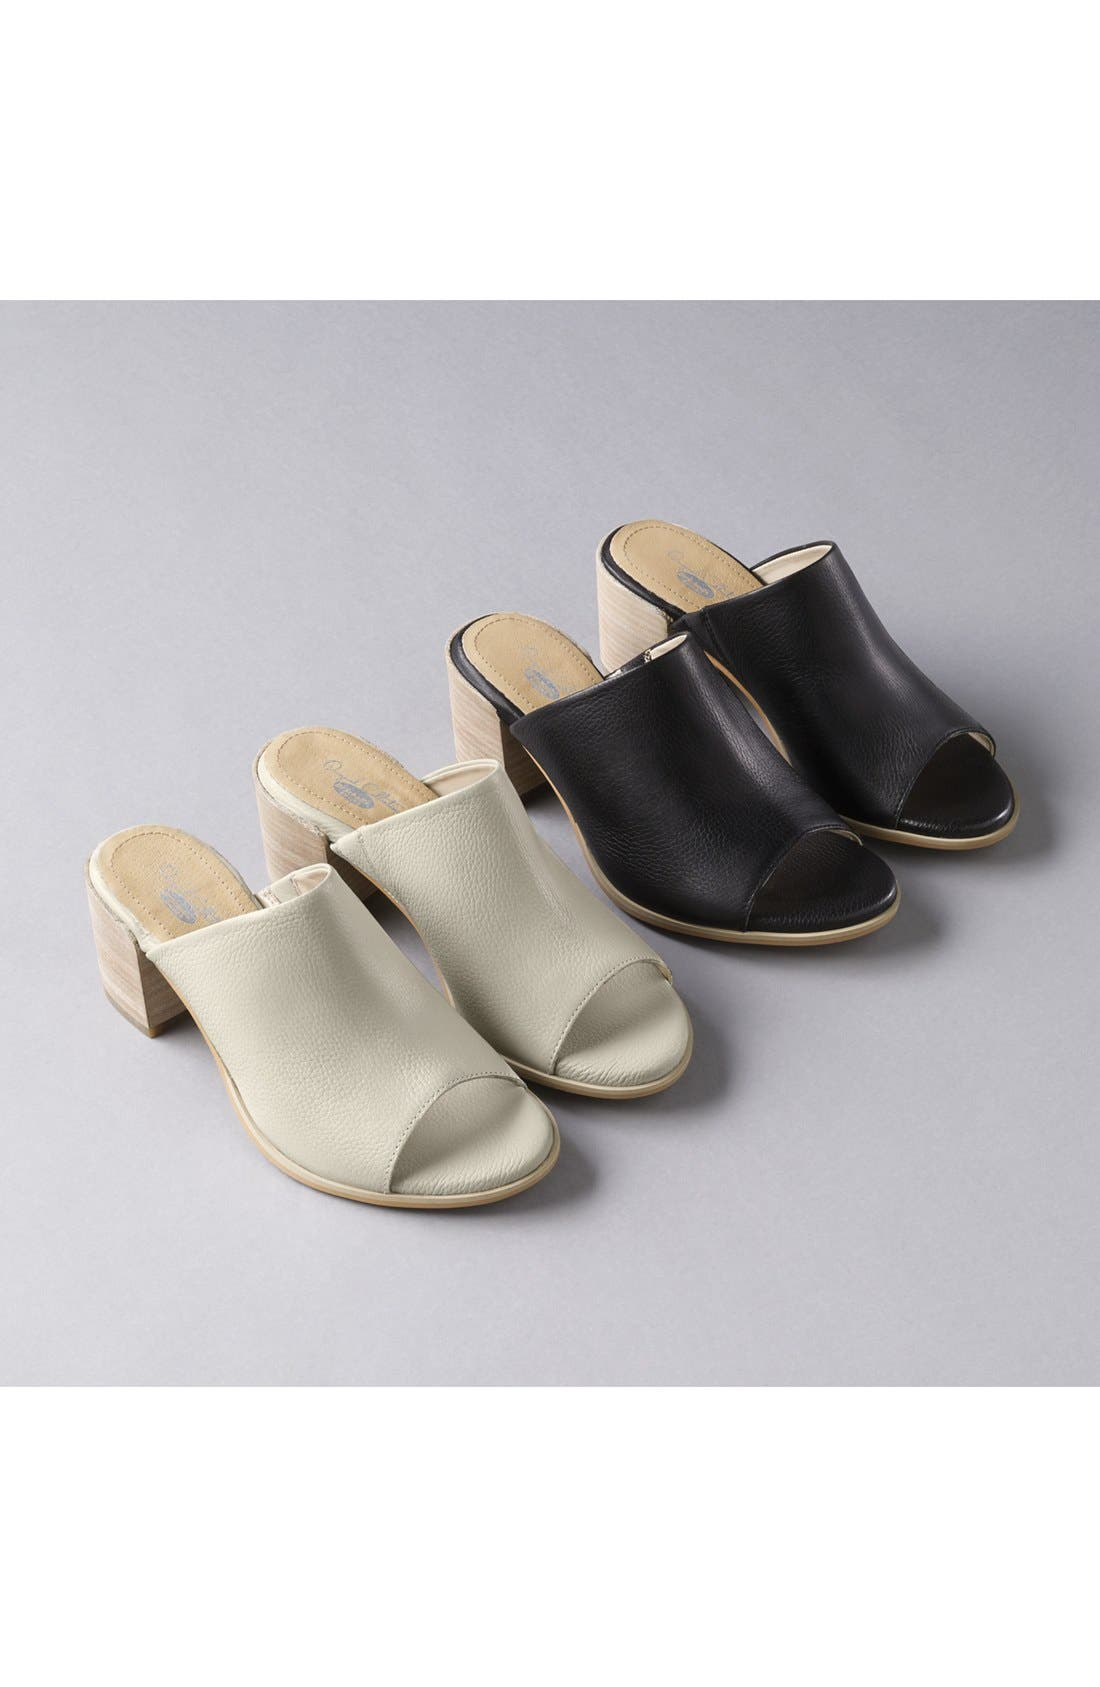 Malin Block Heel Sandal,                             Alternate thumbnail 5, color,                             001